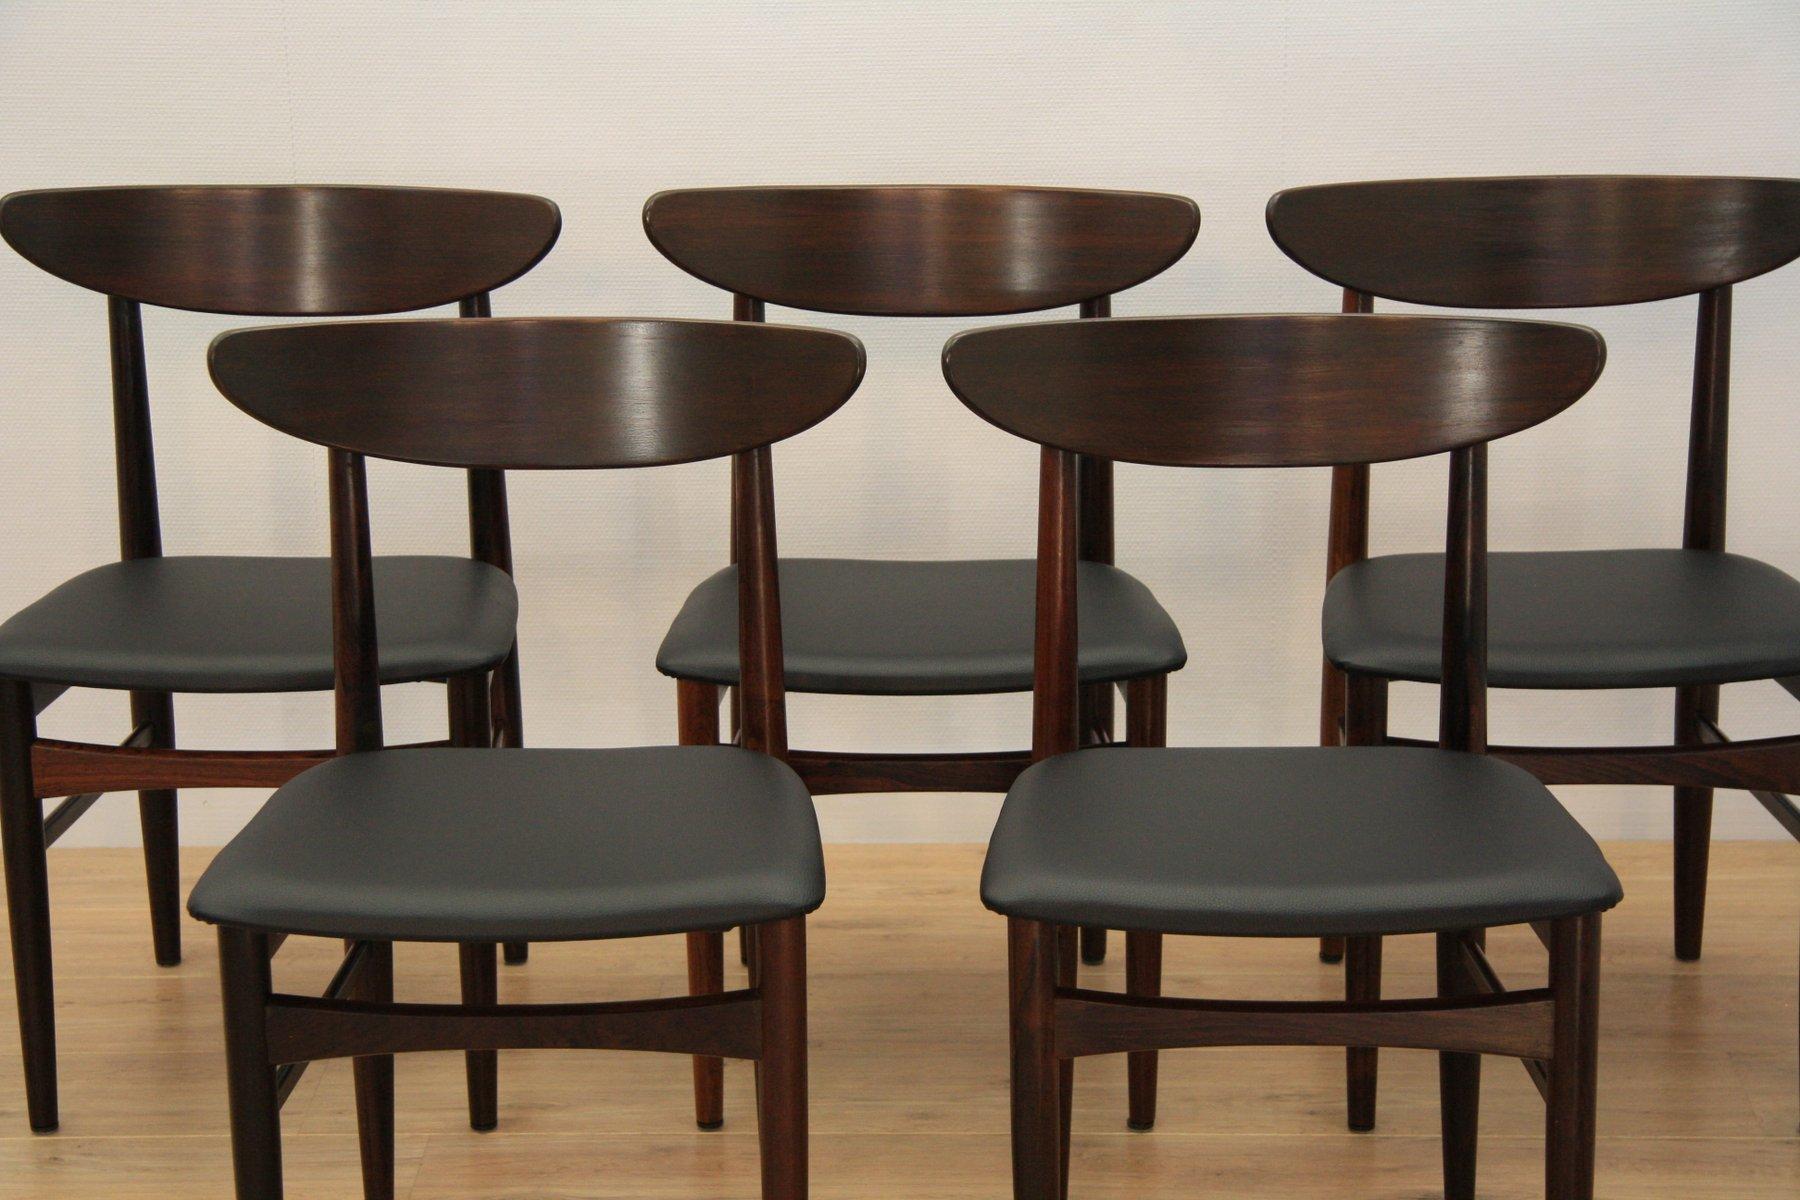 Danish Dining Chairs From Skovby Mobelfabrik, 1960s, Set Of 5